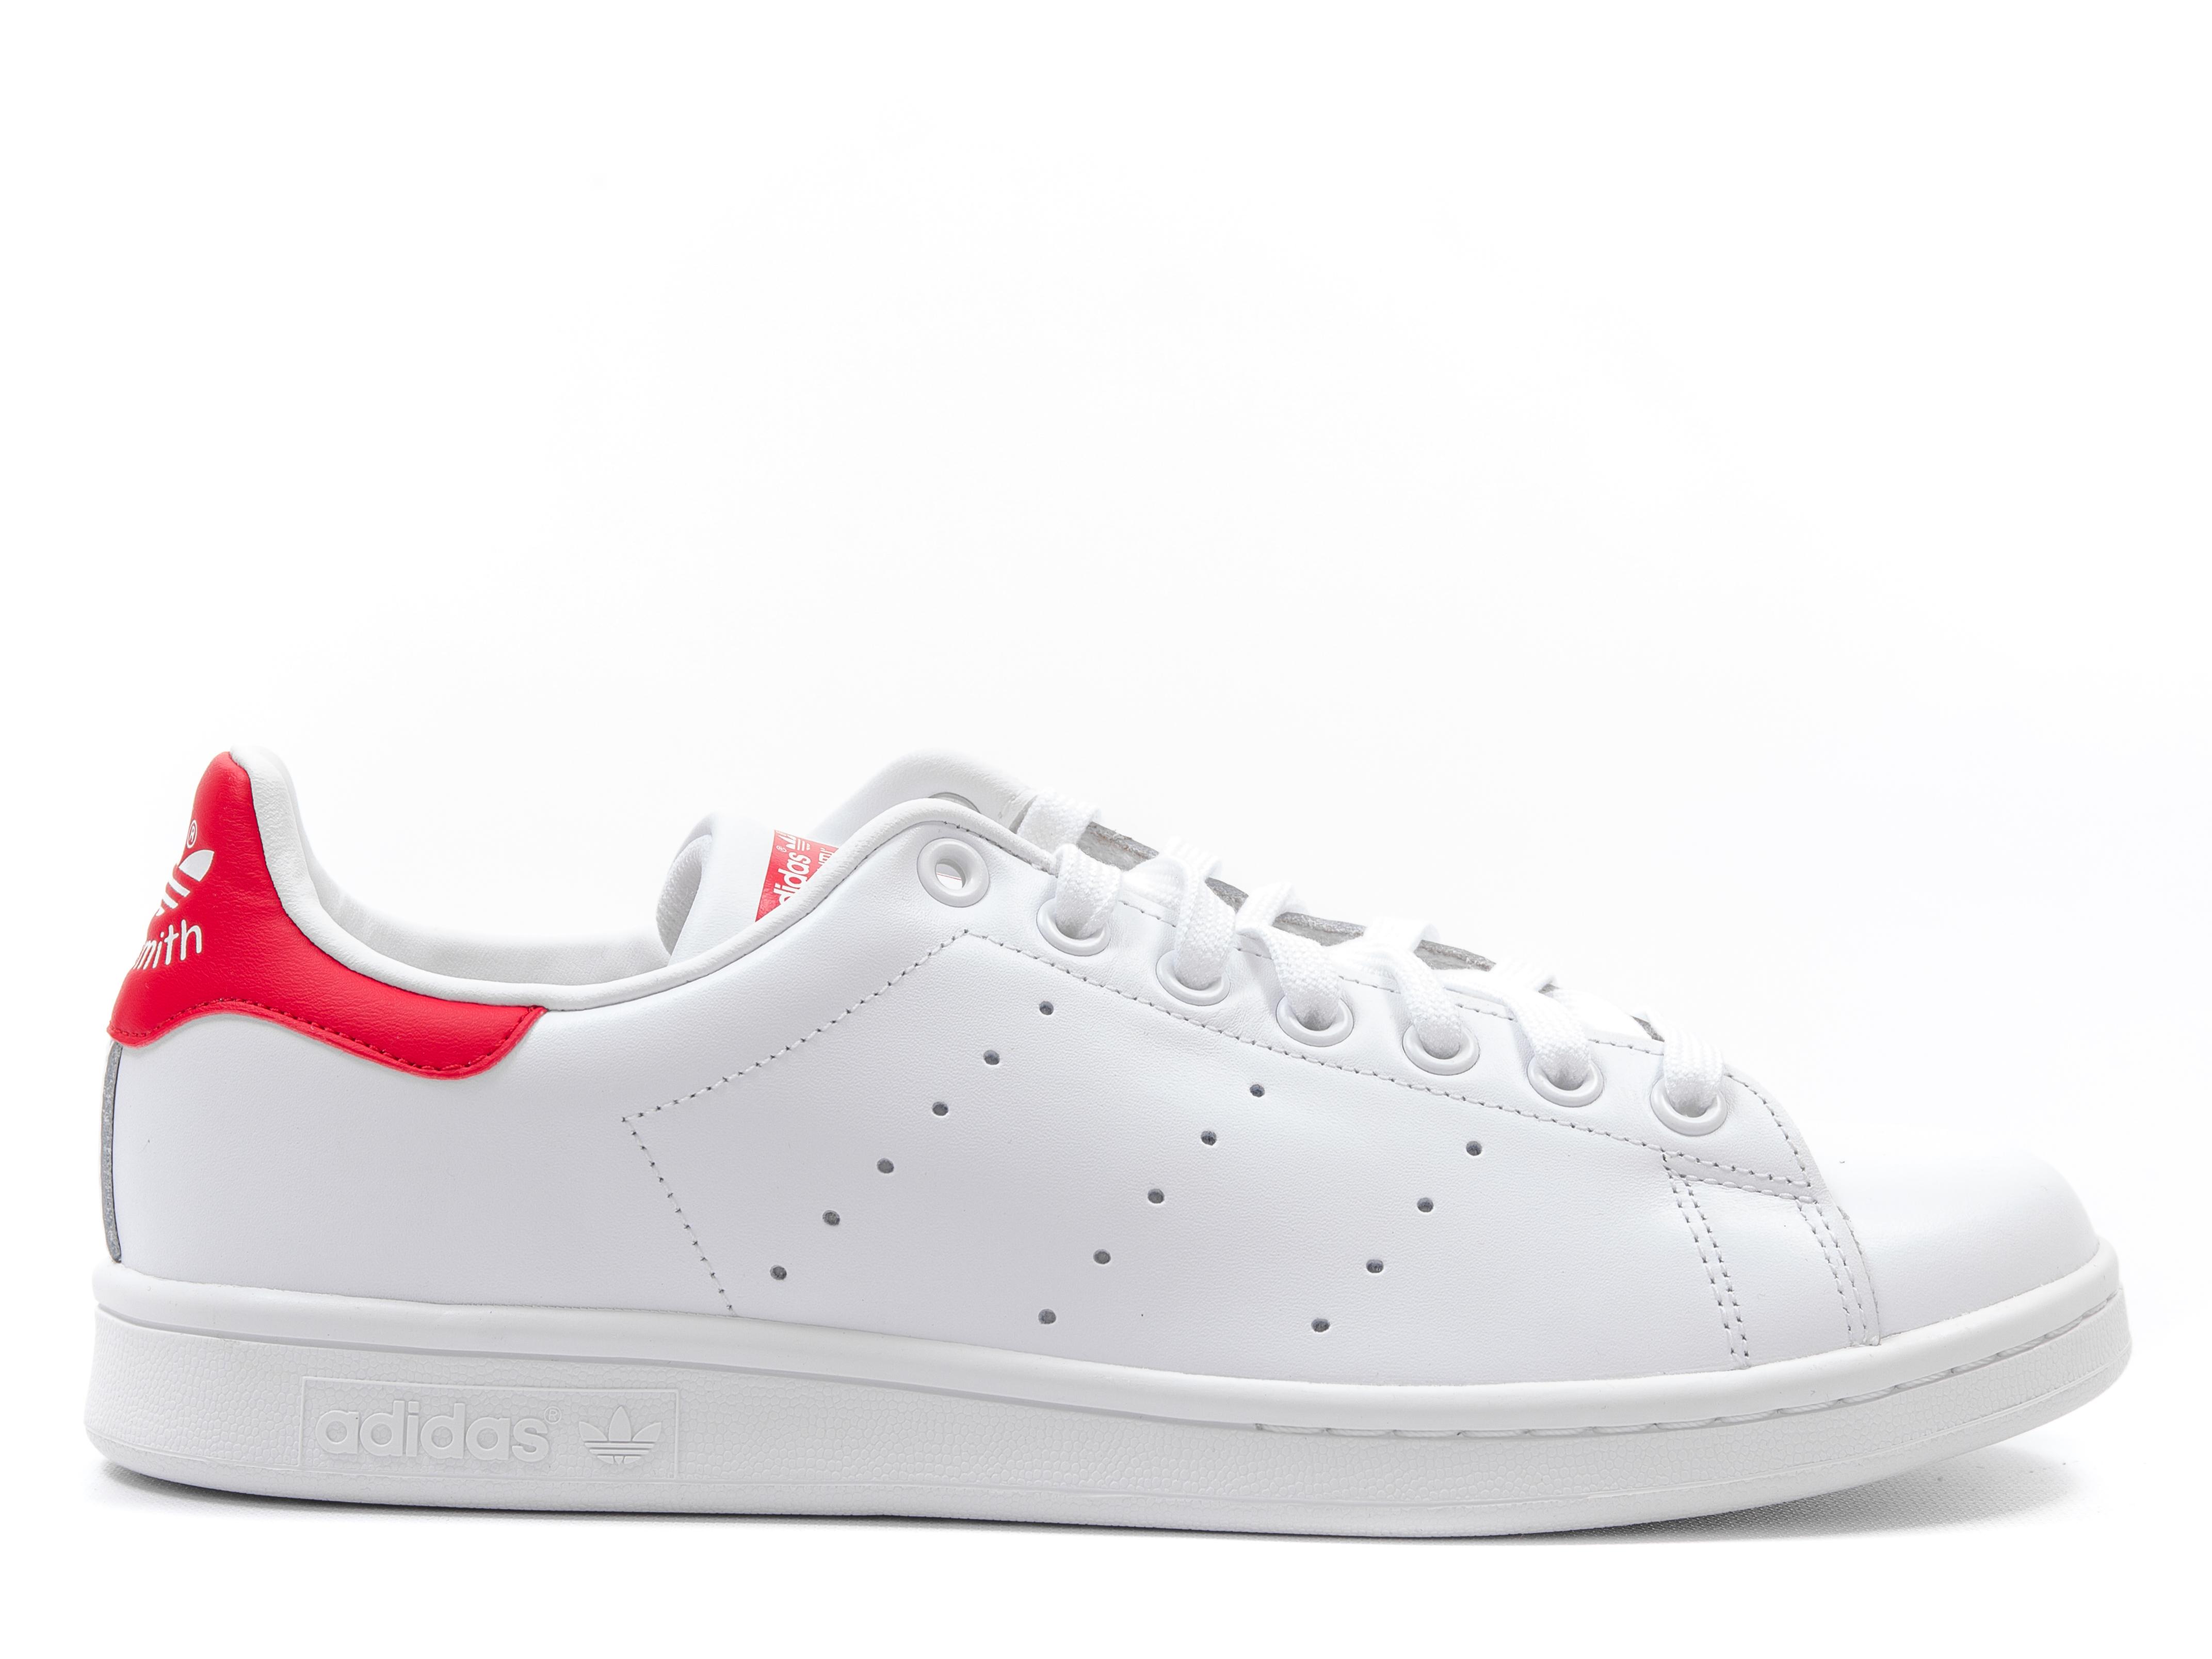 Adidas originals stan smith packer shoes packer shoes for Adidas stan smith colori